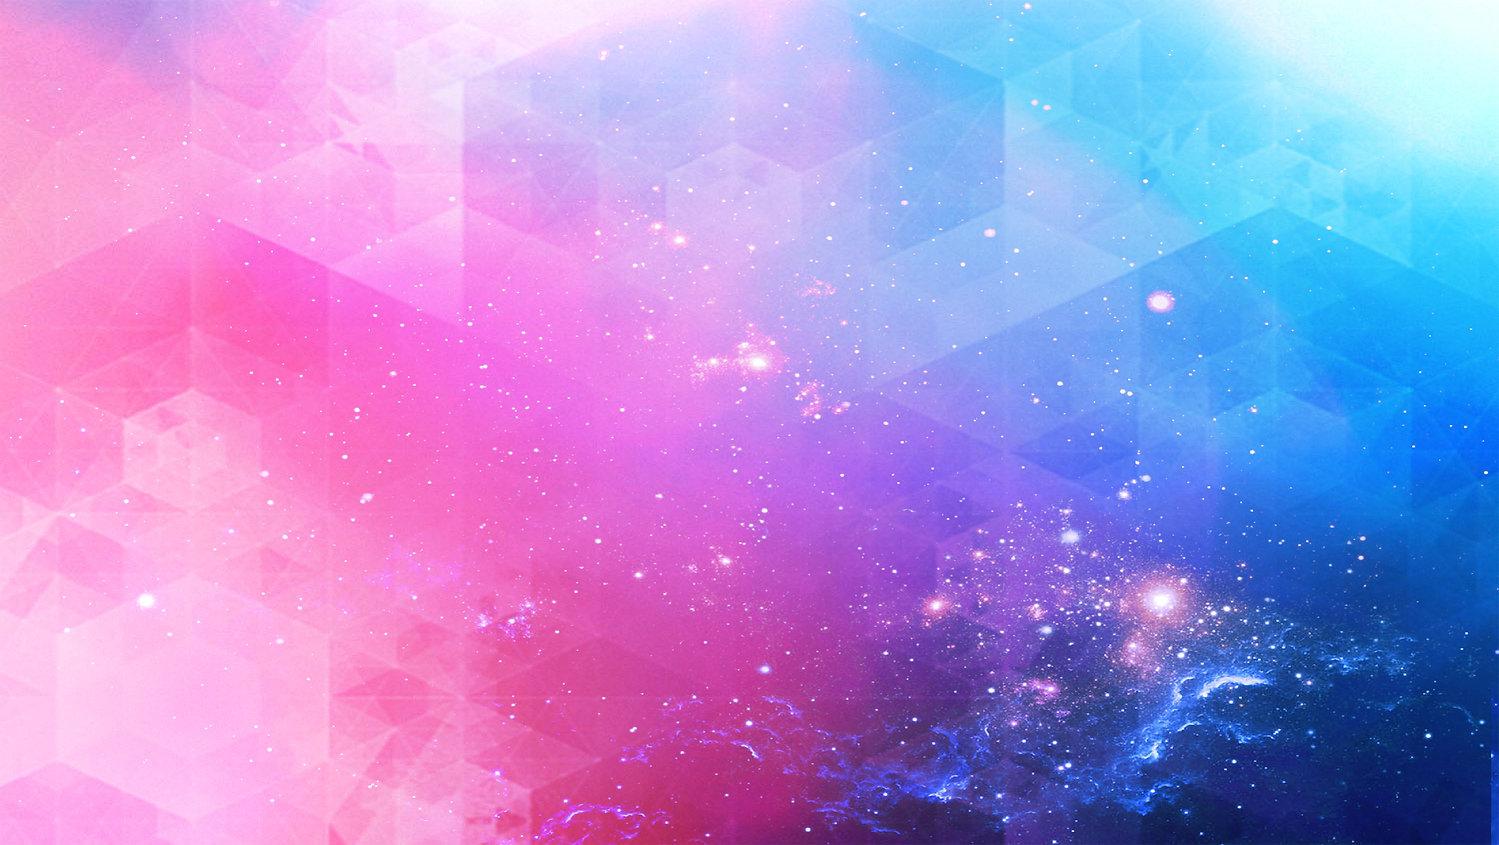 background-1462755.jpg